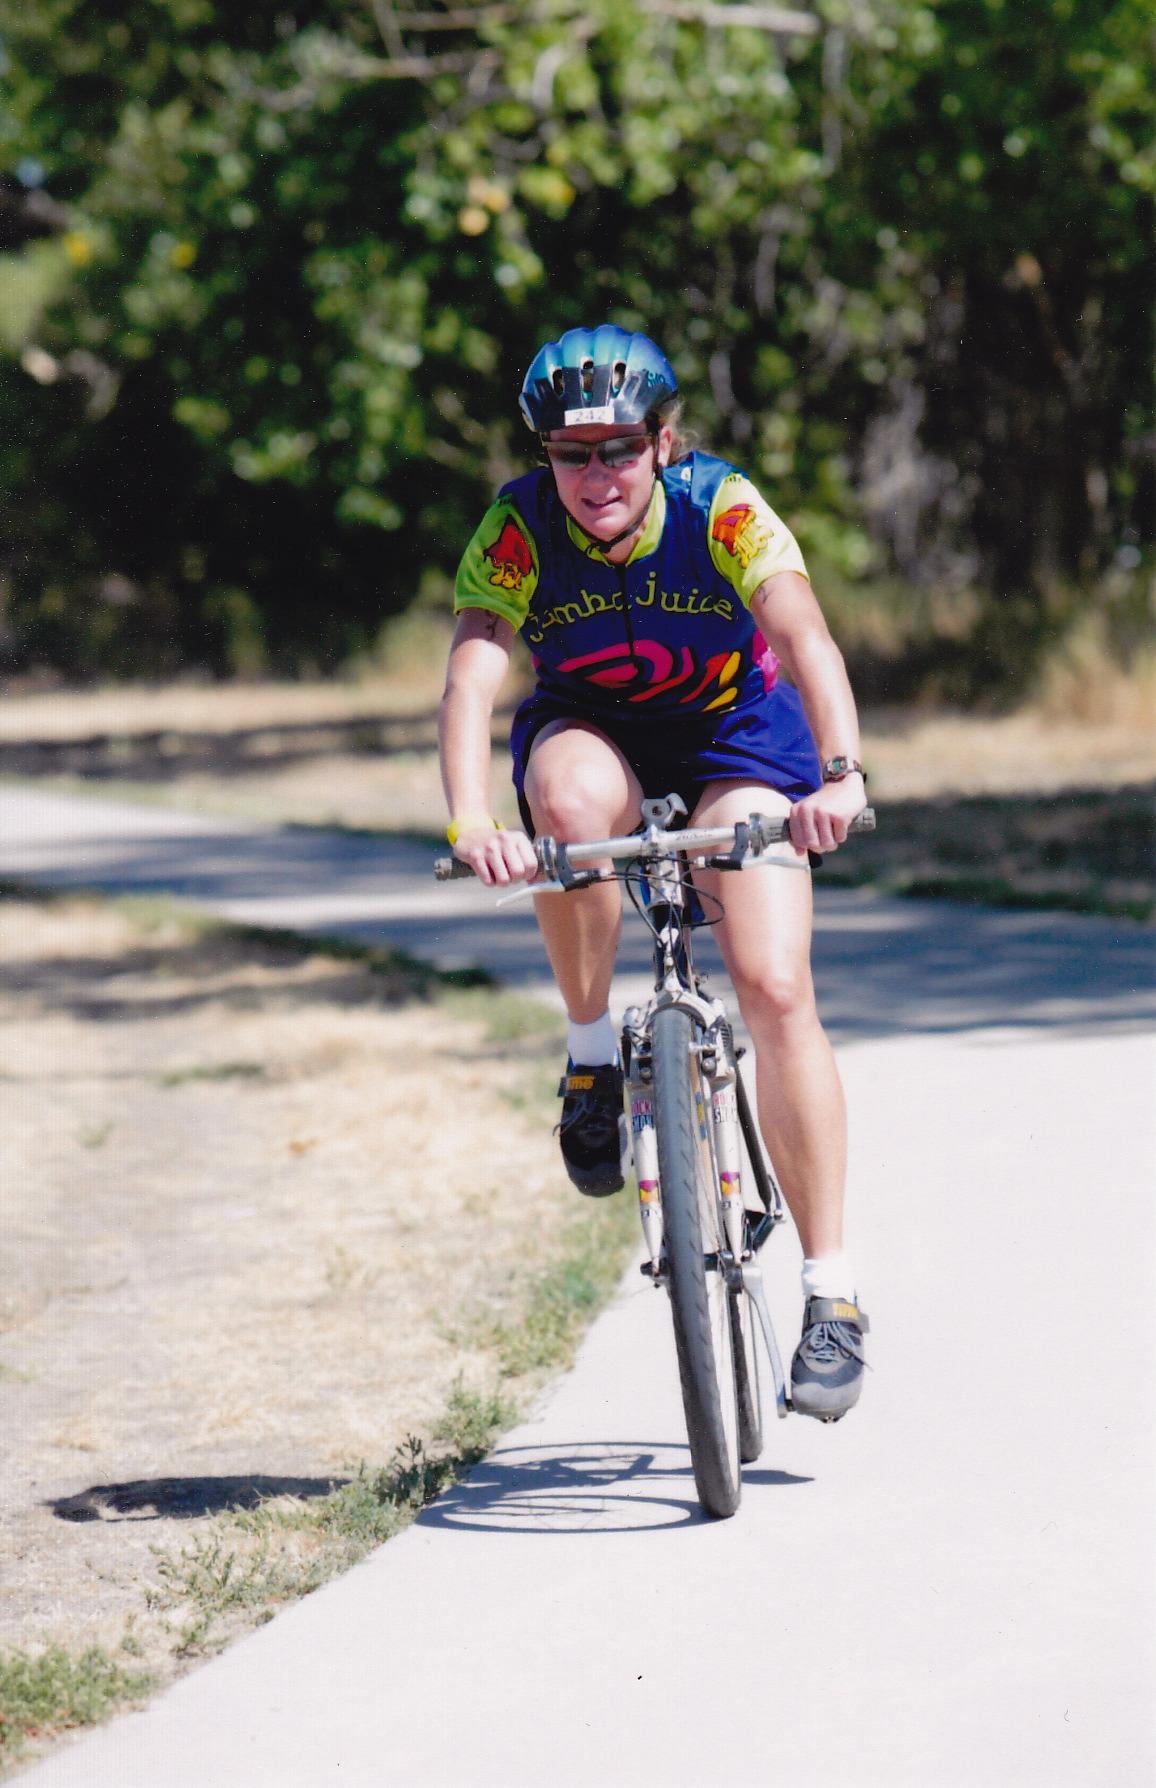 Triathalon in Denver 2002 - rode my mountain bike with slicks.